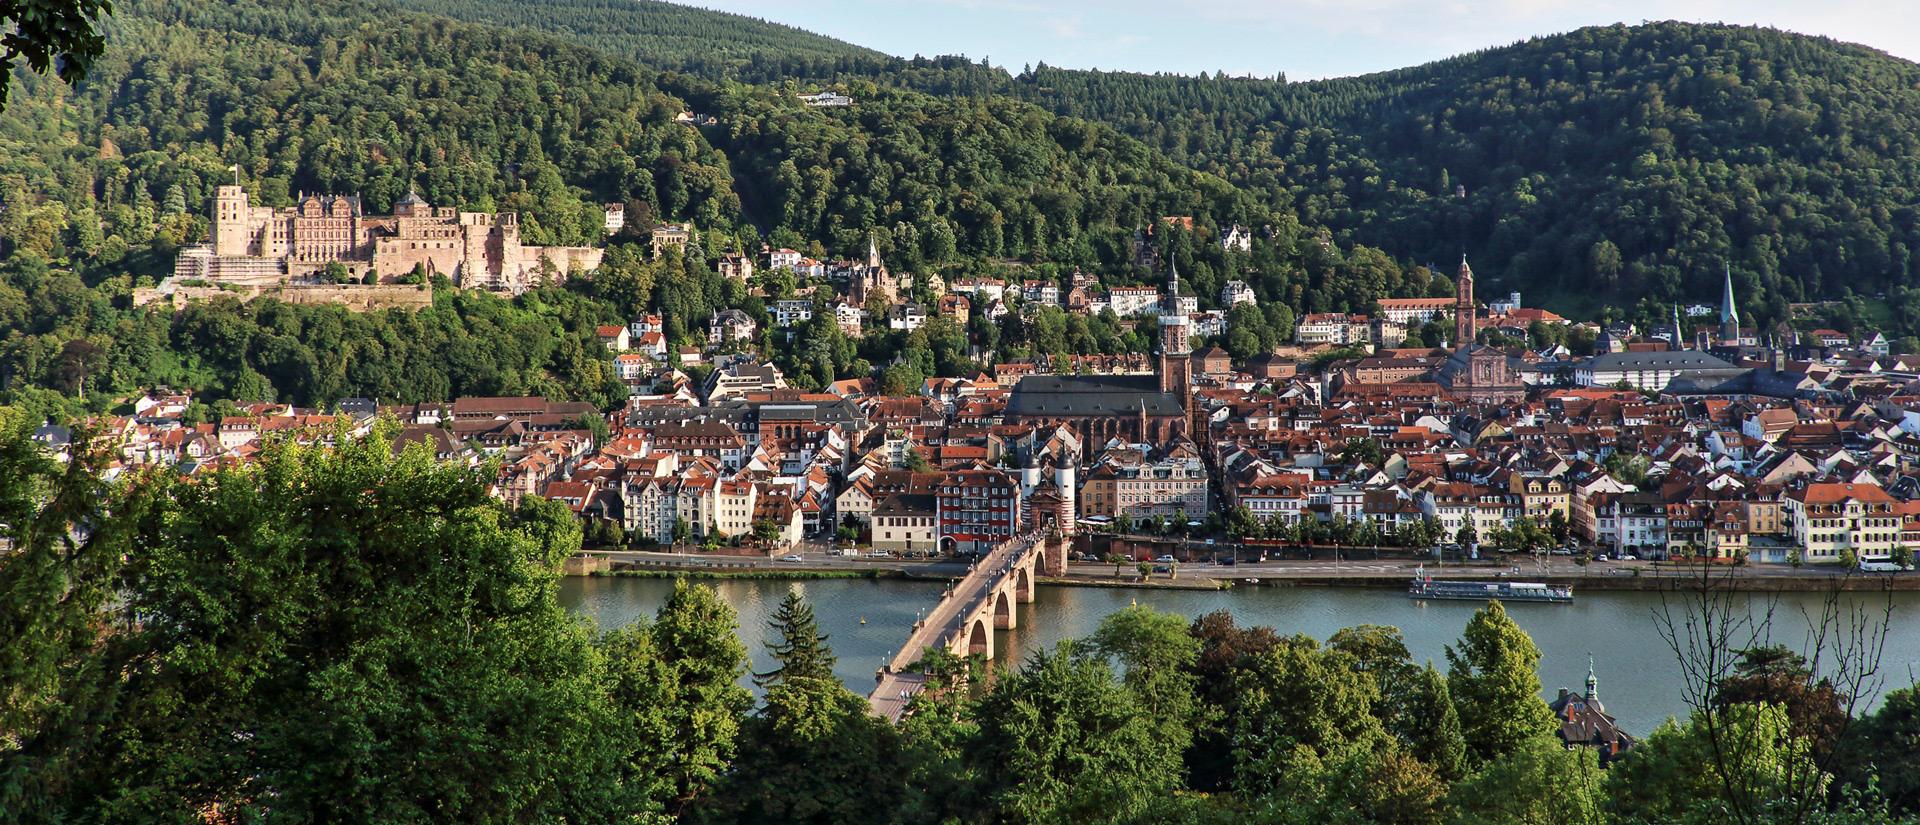 Botanischer Garten Heidelberg Inspirierend Hotels Heidelberg Germany